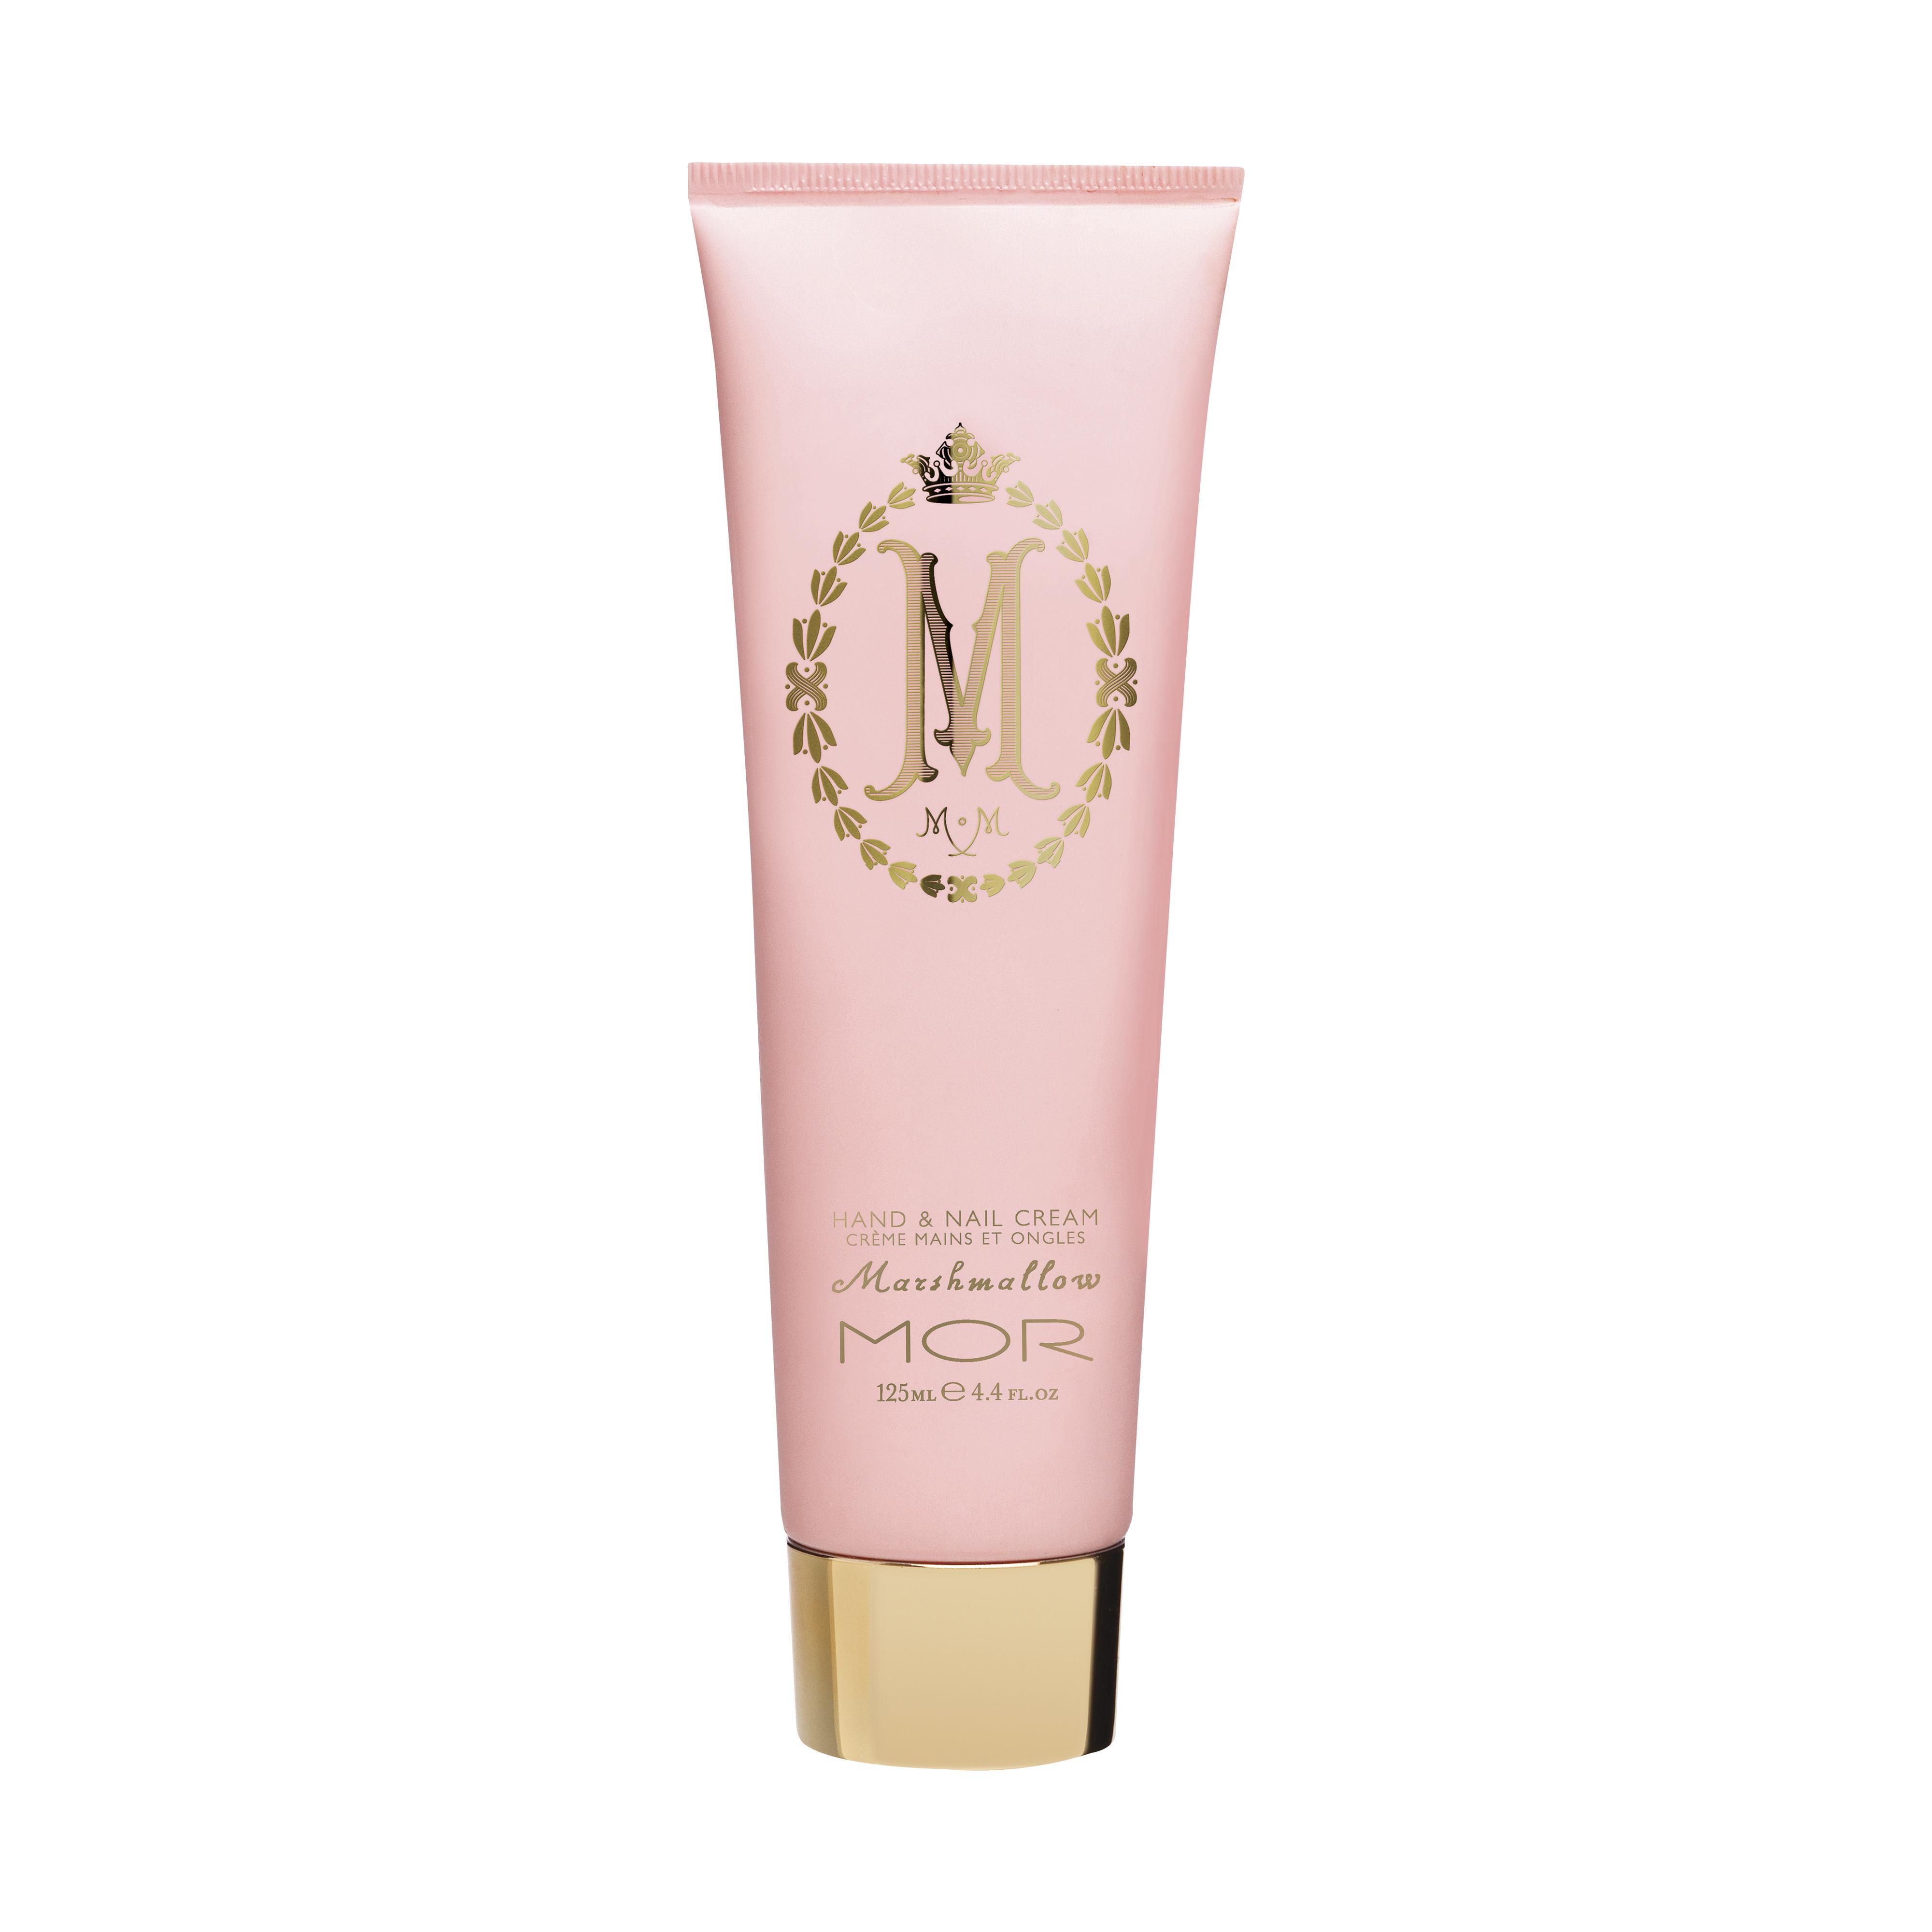 Marshmellow Hand & Nail Cream 125ml